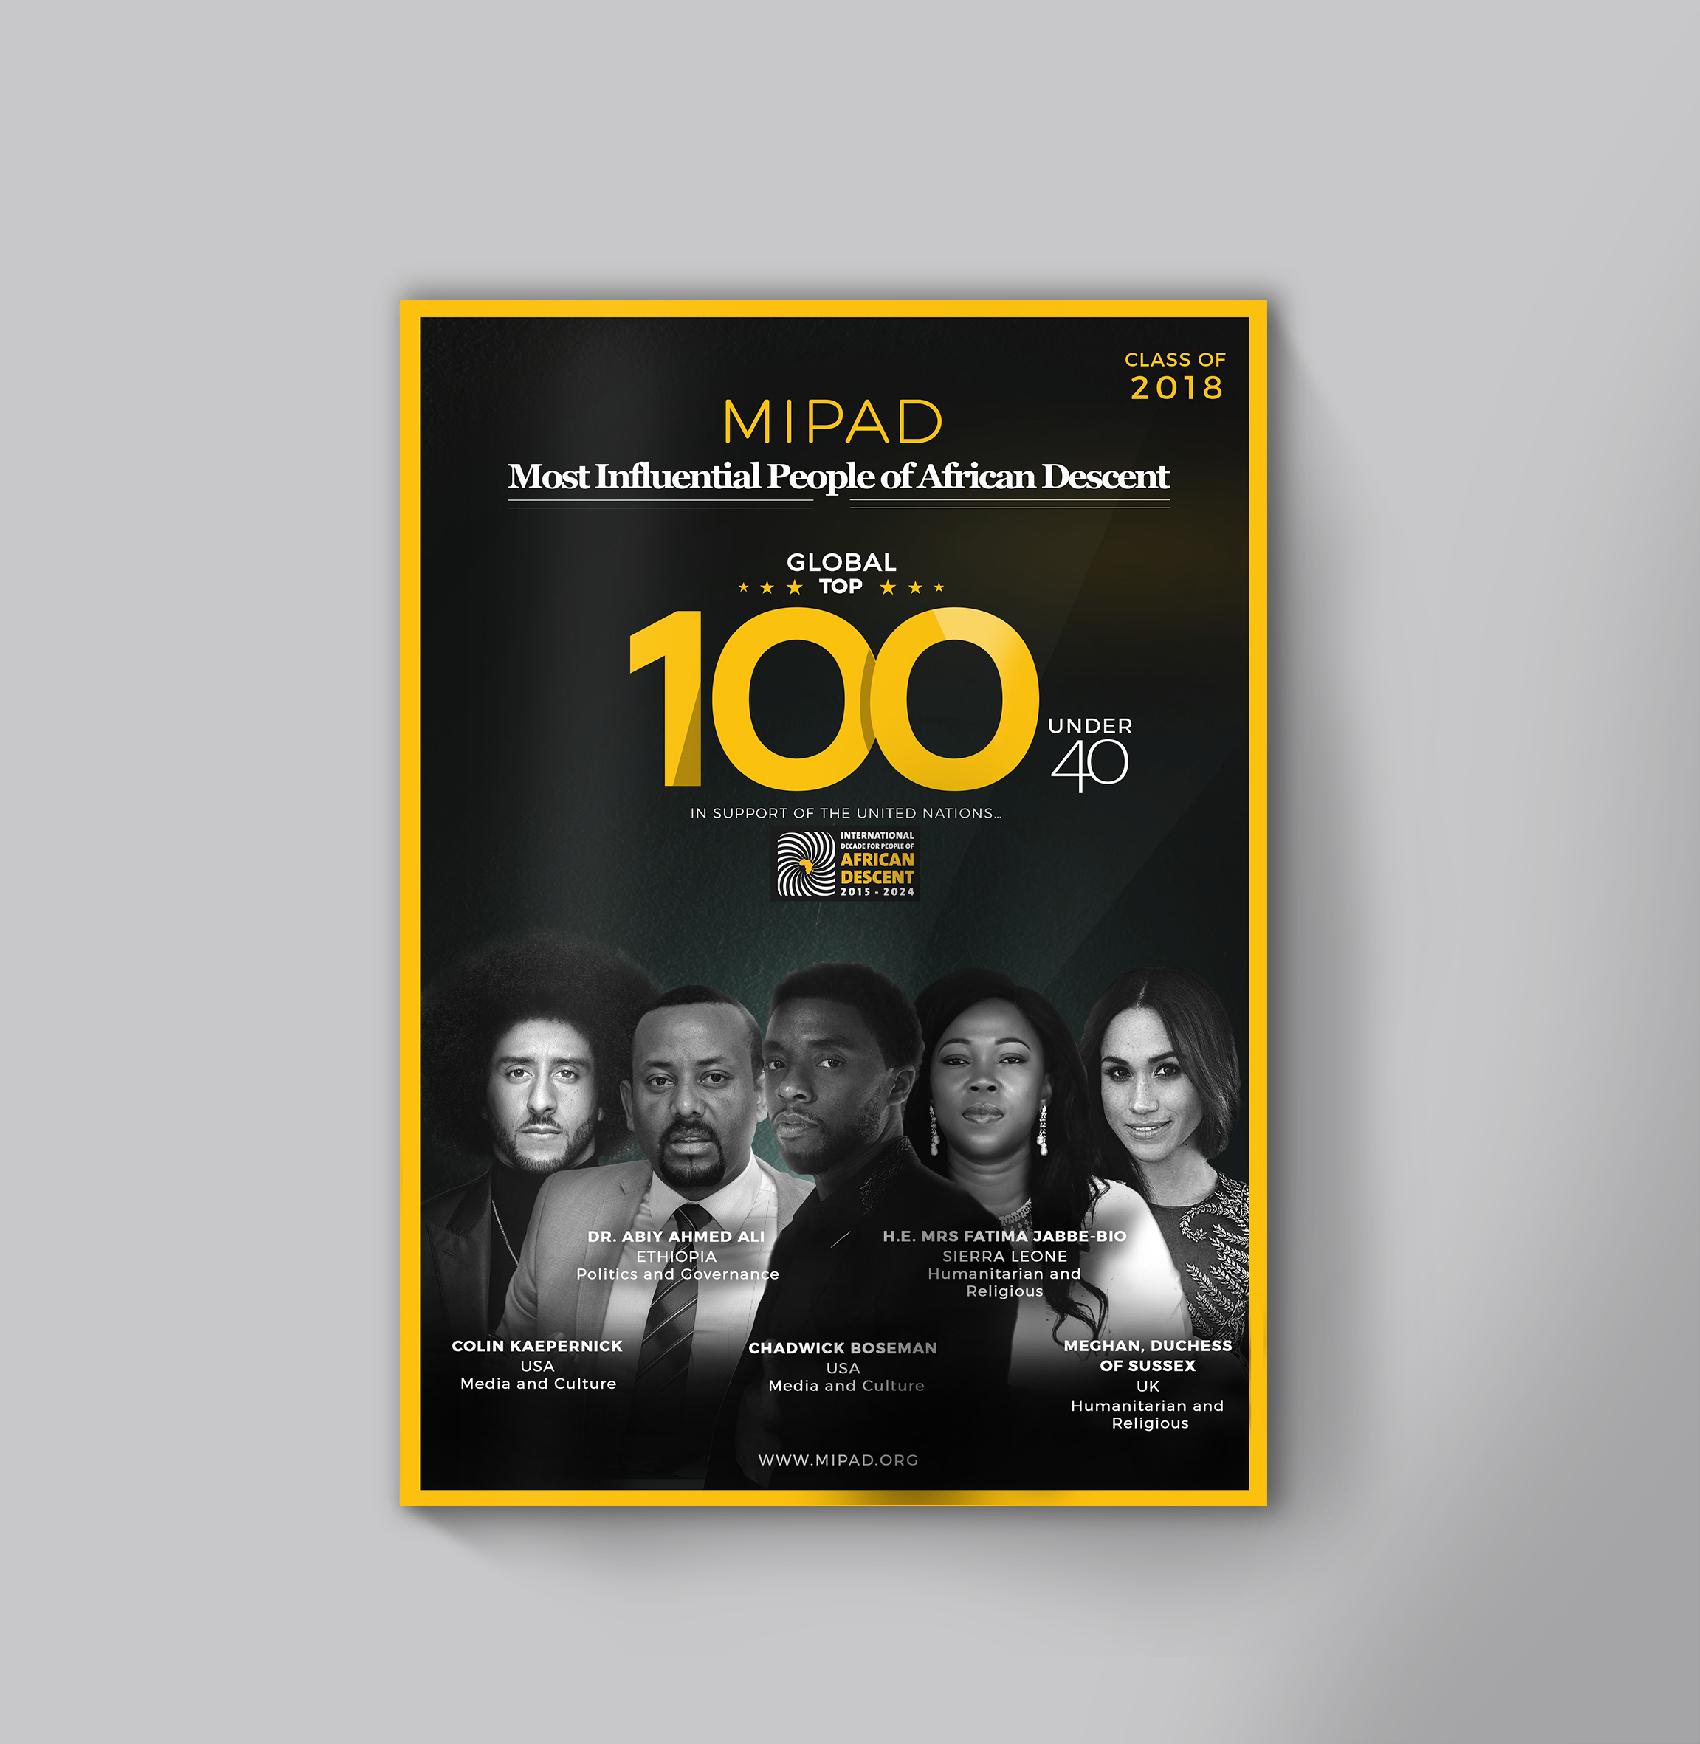 MIPAD-2018-COVER